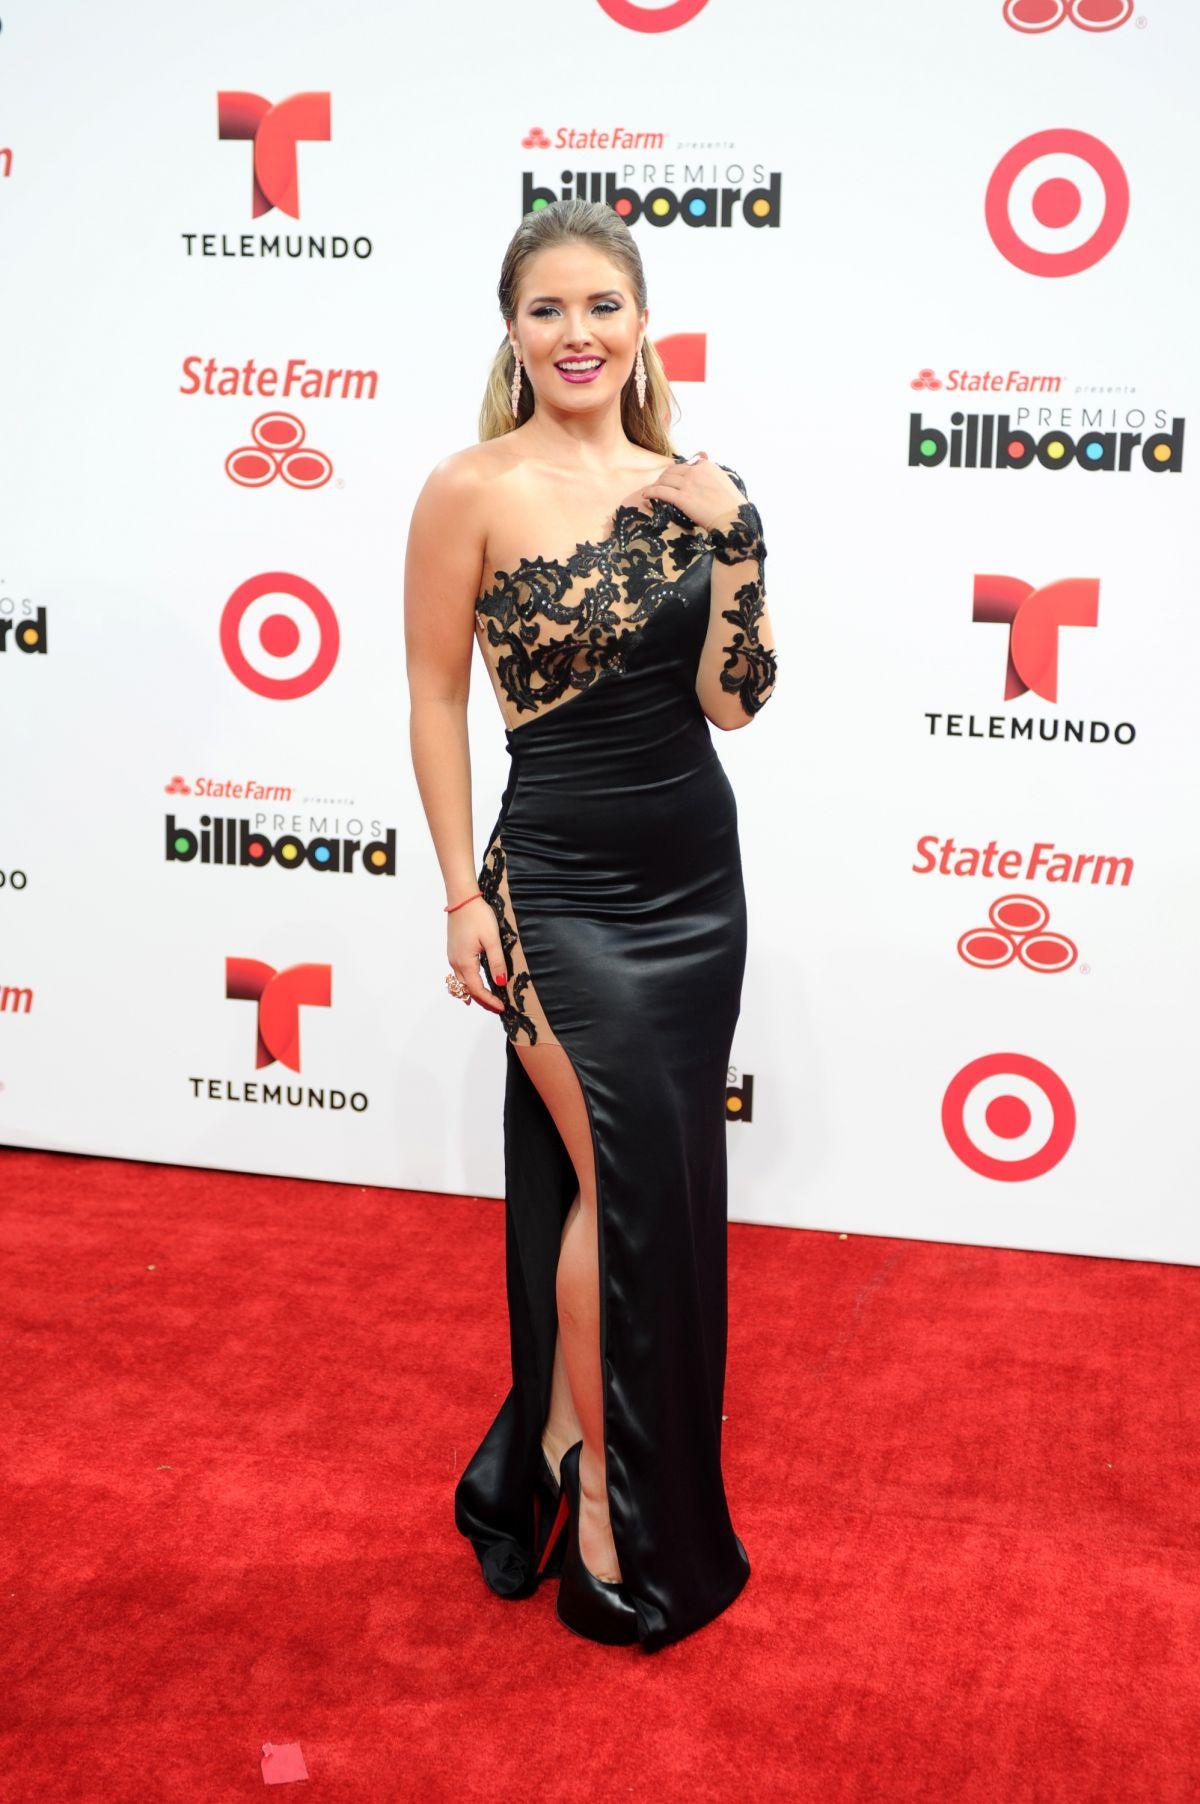 KIMBERLY DOS RAMOS at 2014 Billboard Latin Music Awards in Miami